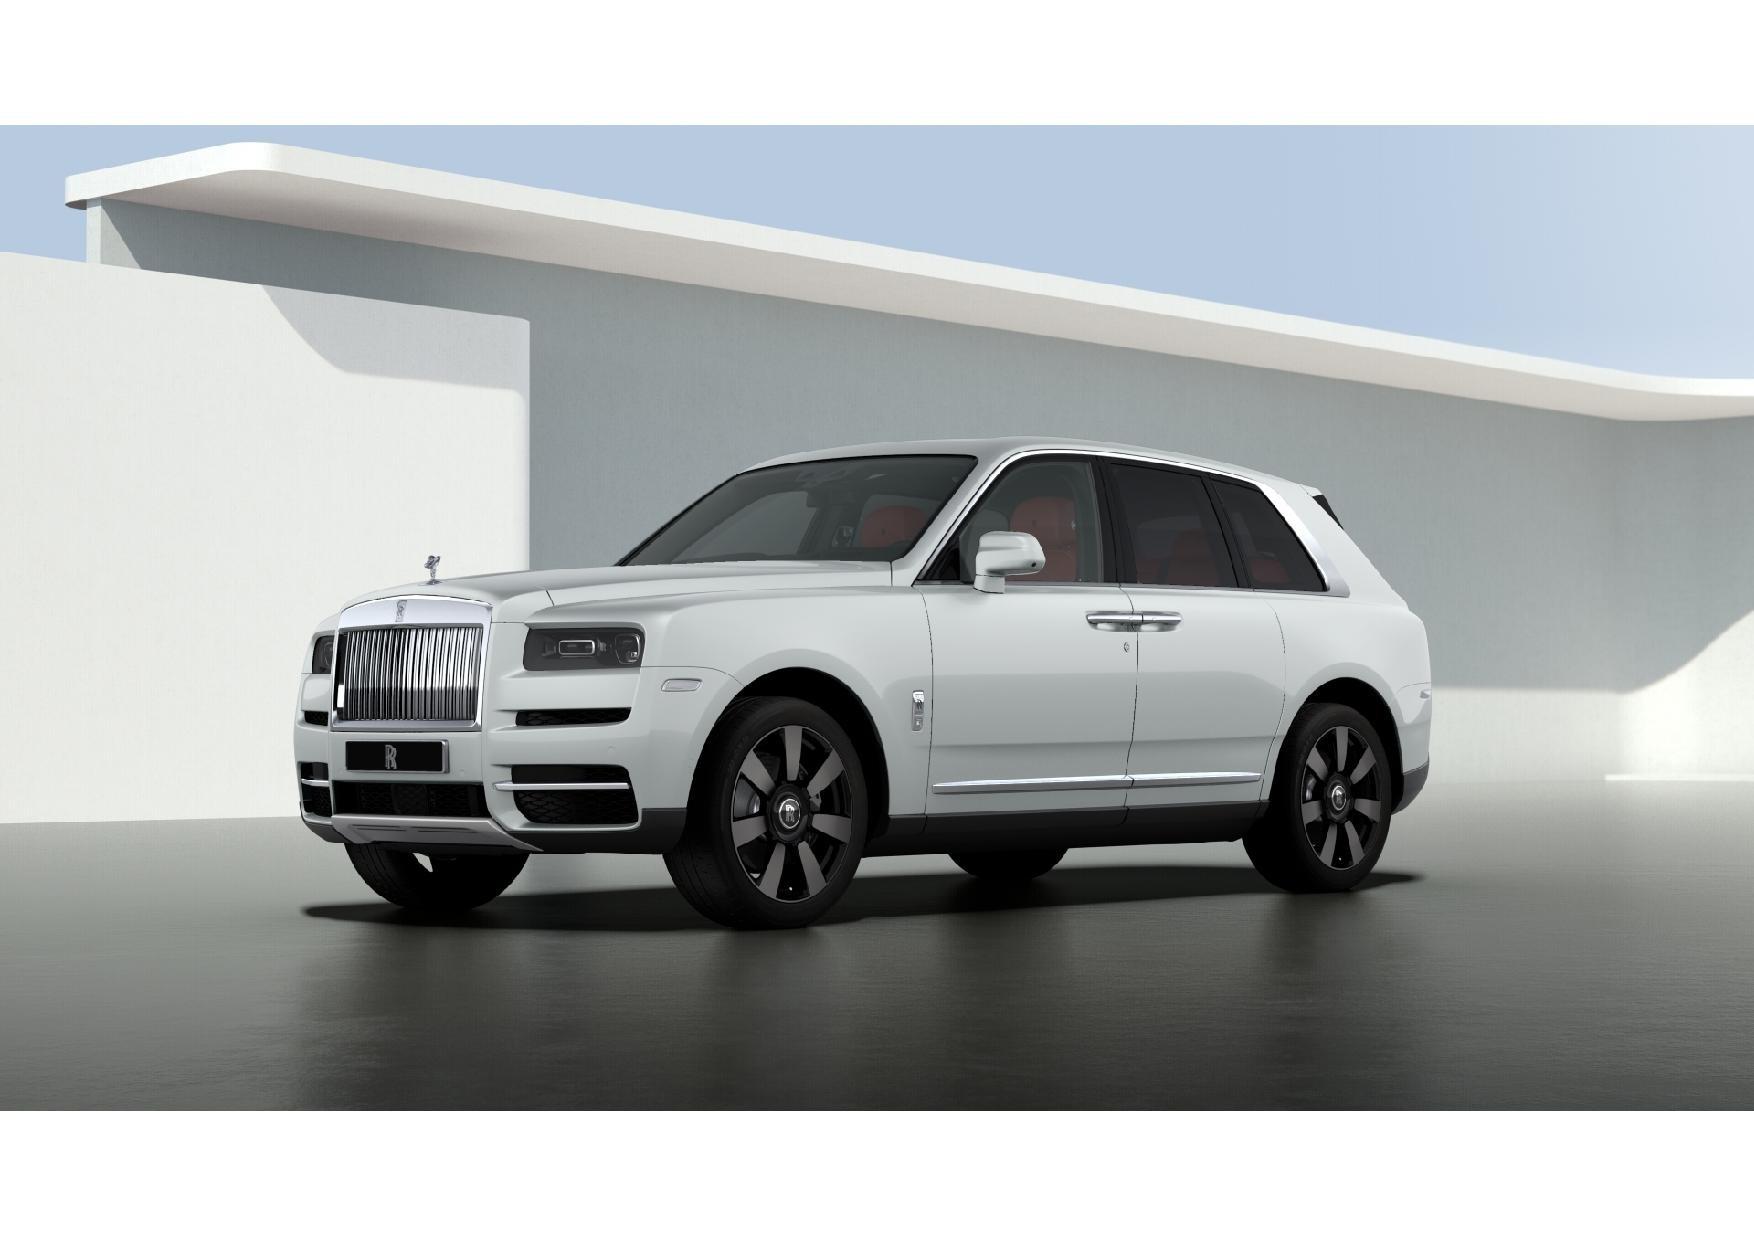 New 2021 Rolls-Royce Cullinan for sale $391,375 at Bugatti of Greenwich in Greenwich CT 06830 1